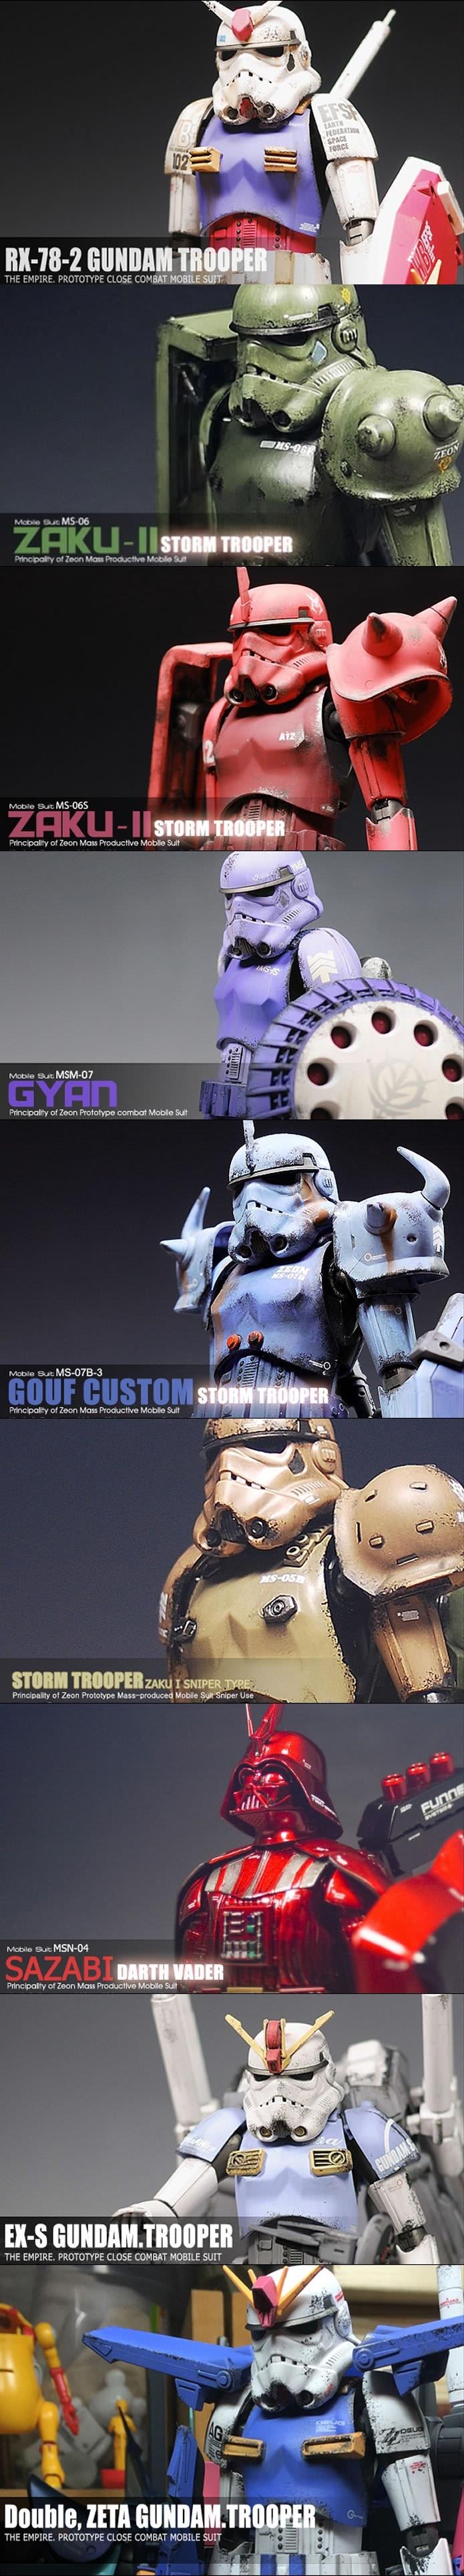 Star wars gundam models